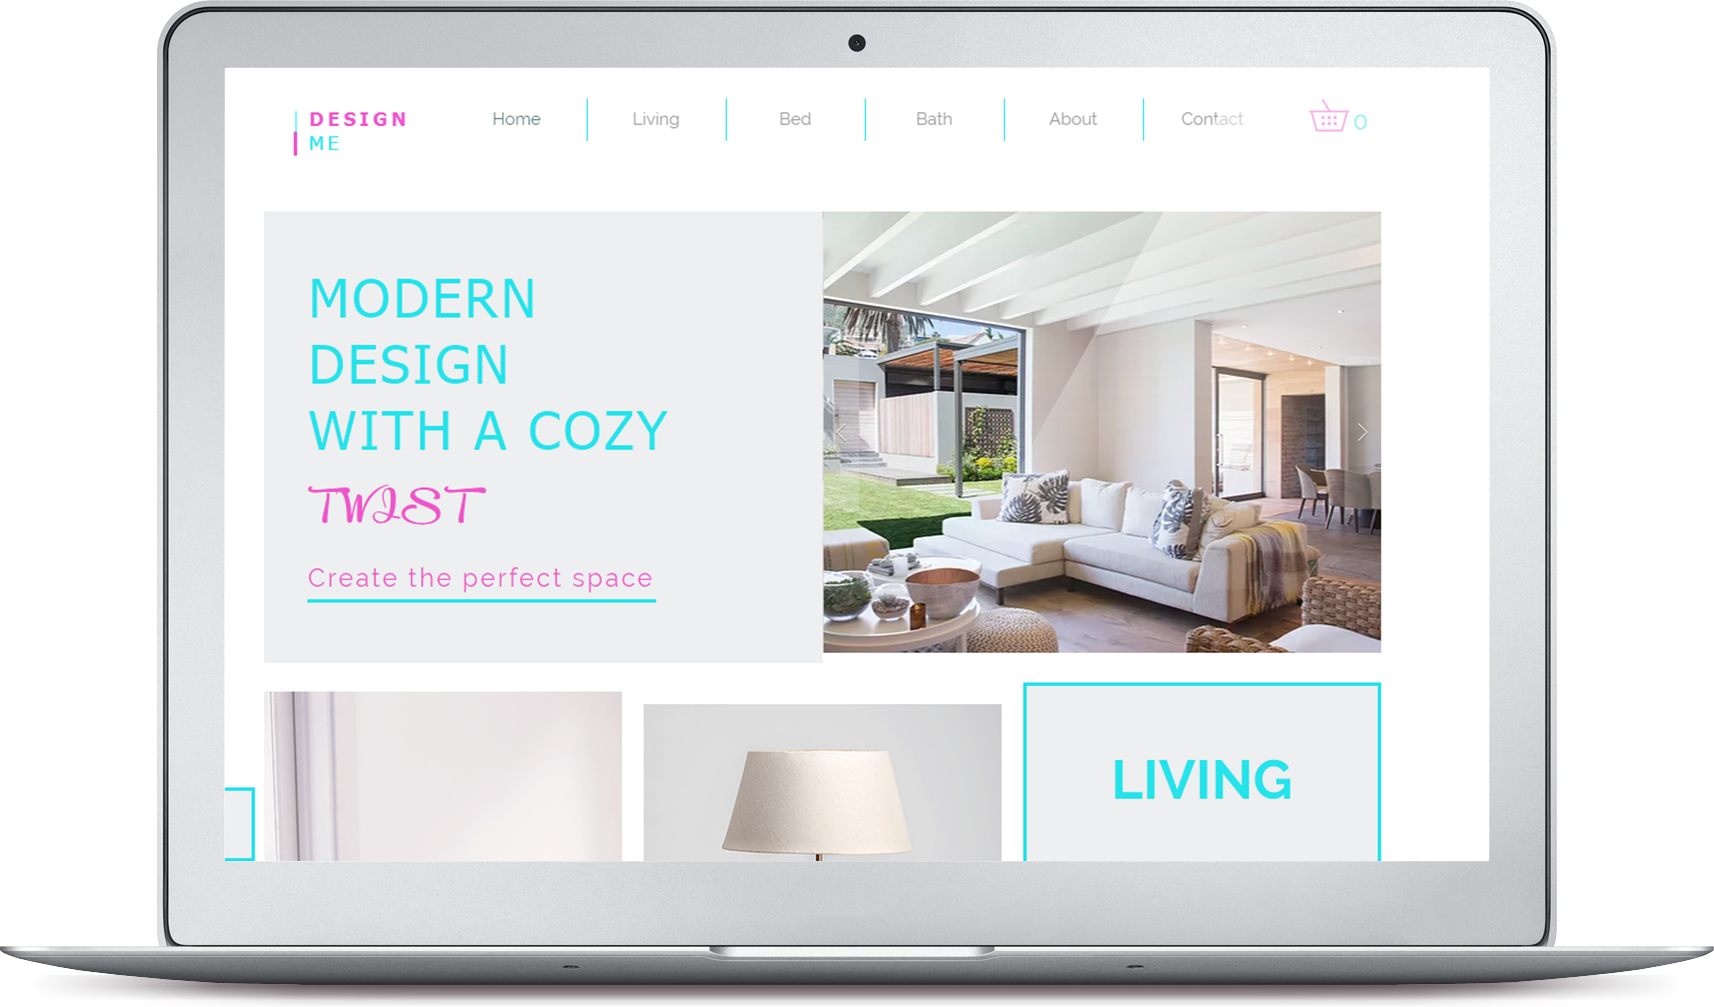 designme_home(laptopmini).png